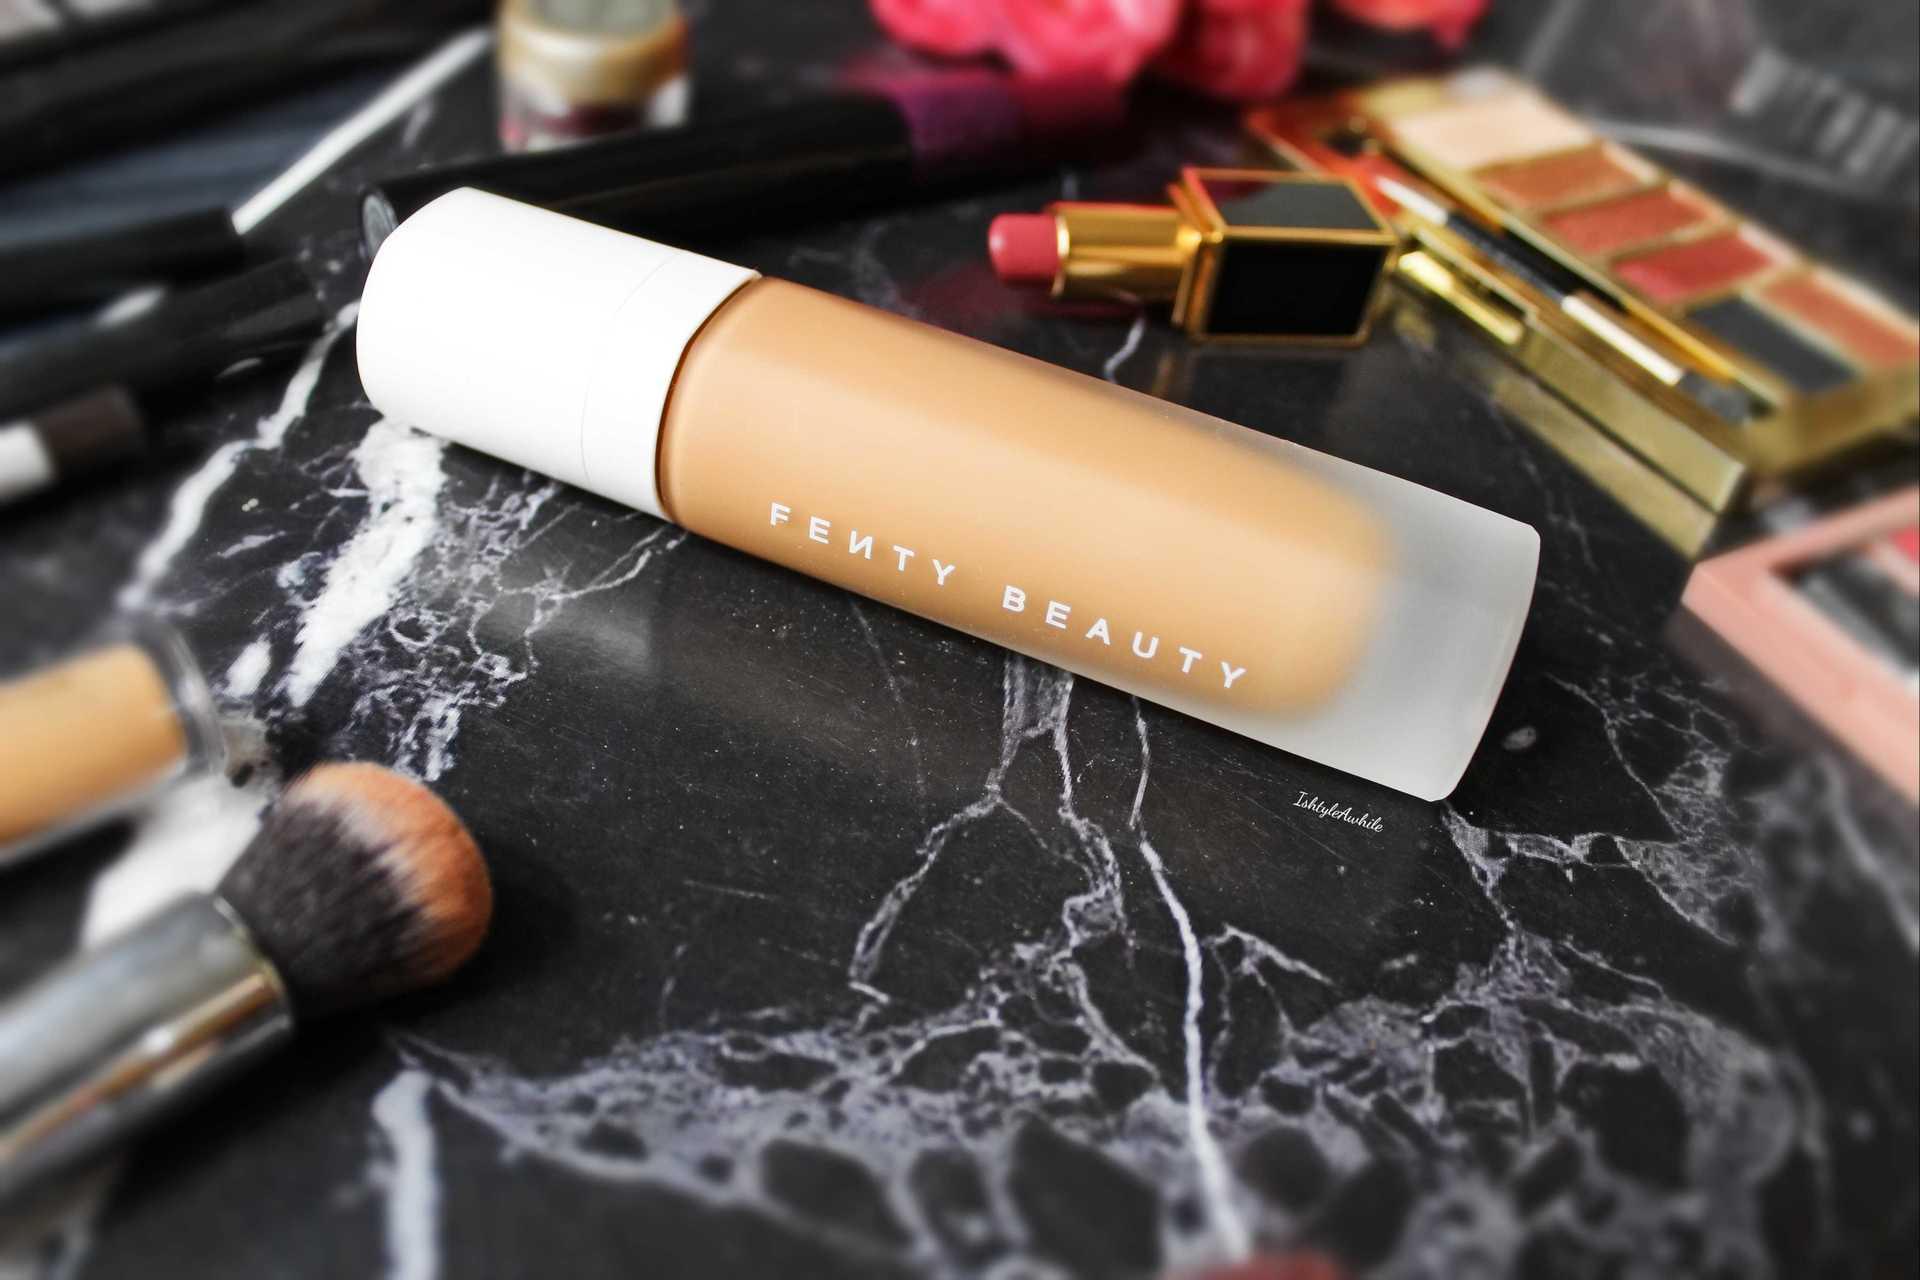 IshtyleAwhile - Fenty beauty foundation chennai beauty blogger